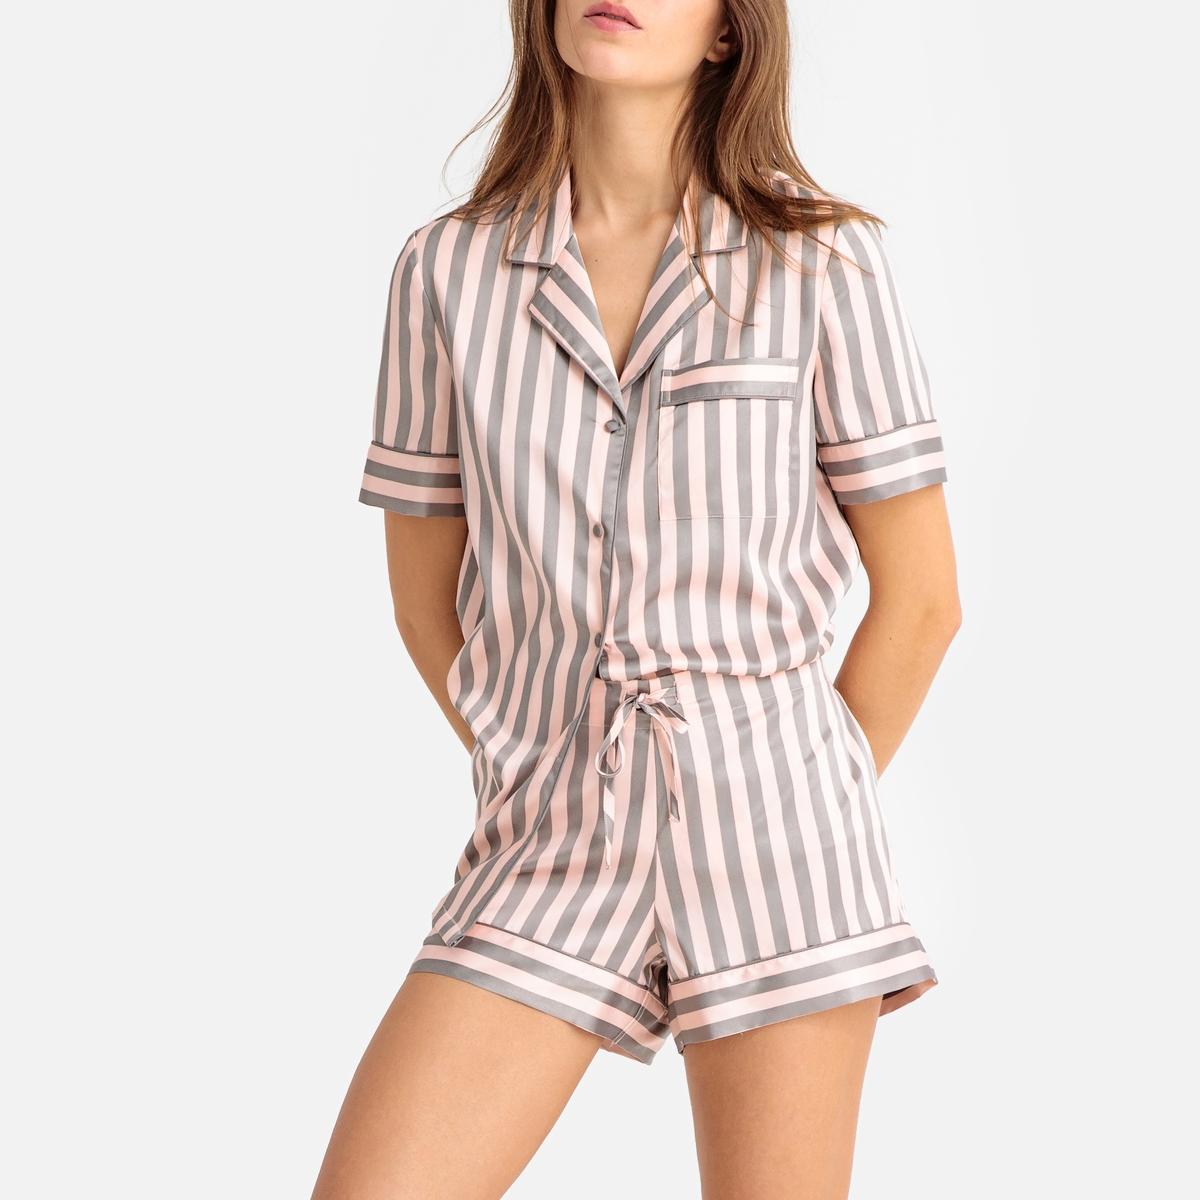 Pijama con short a rayas